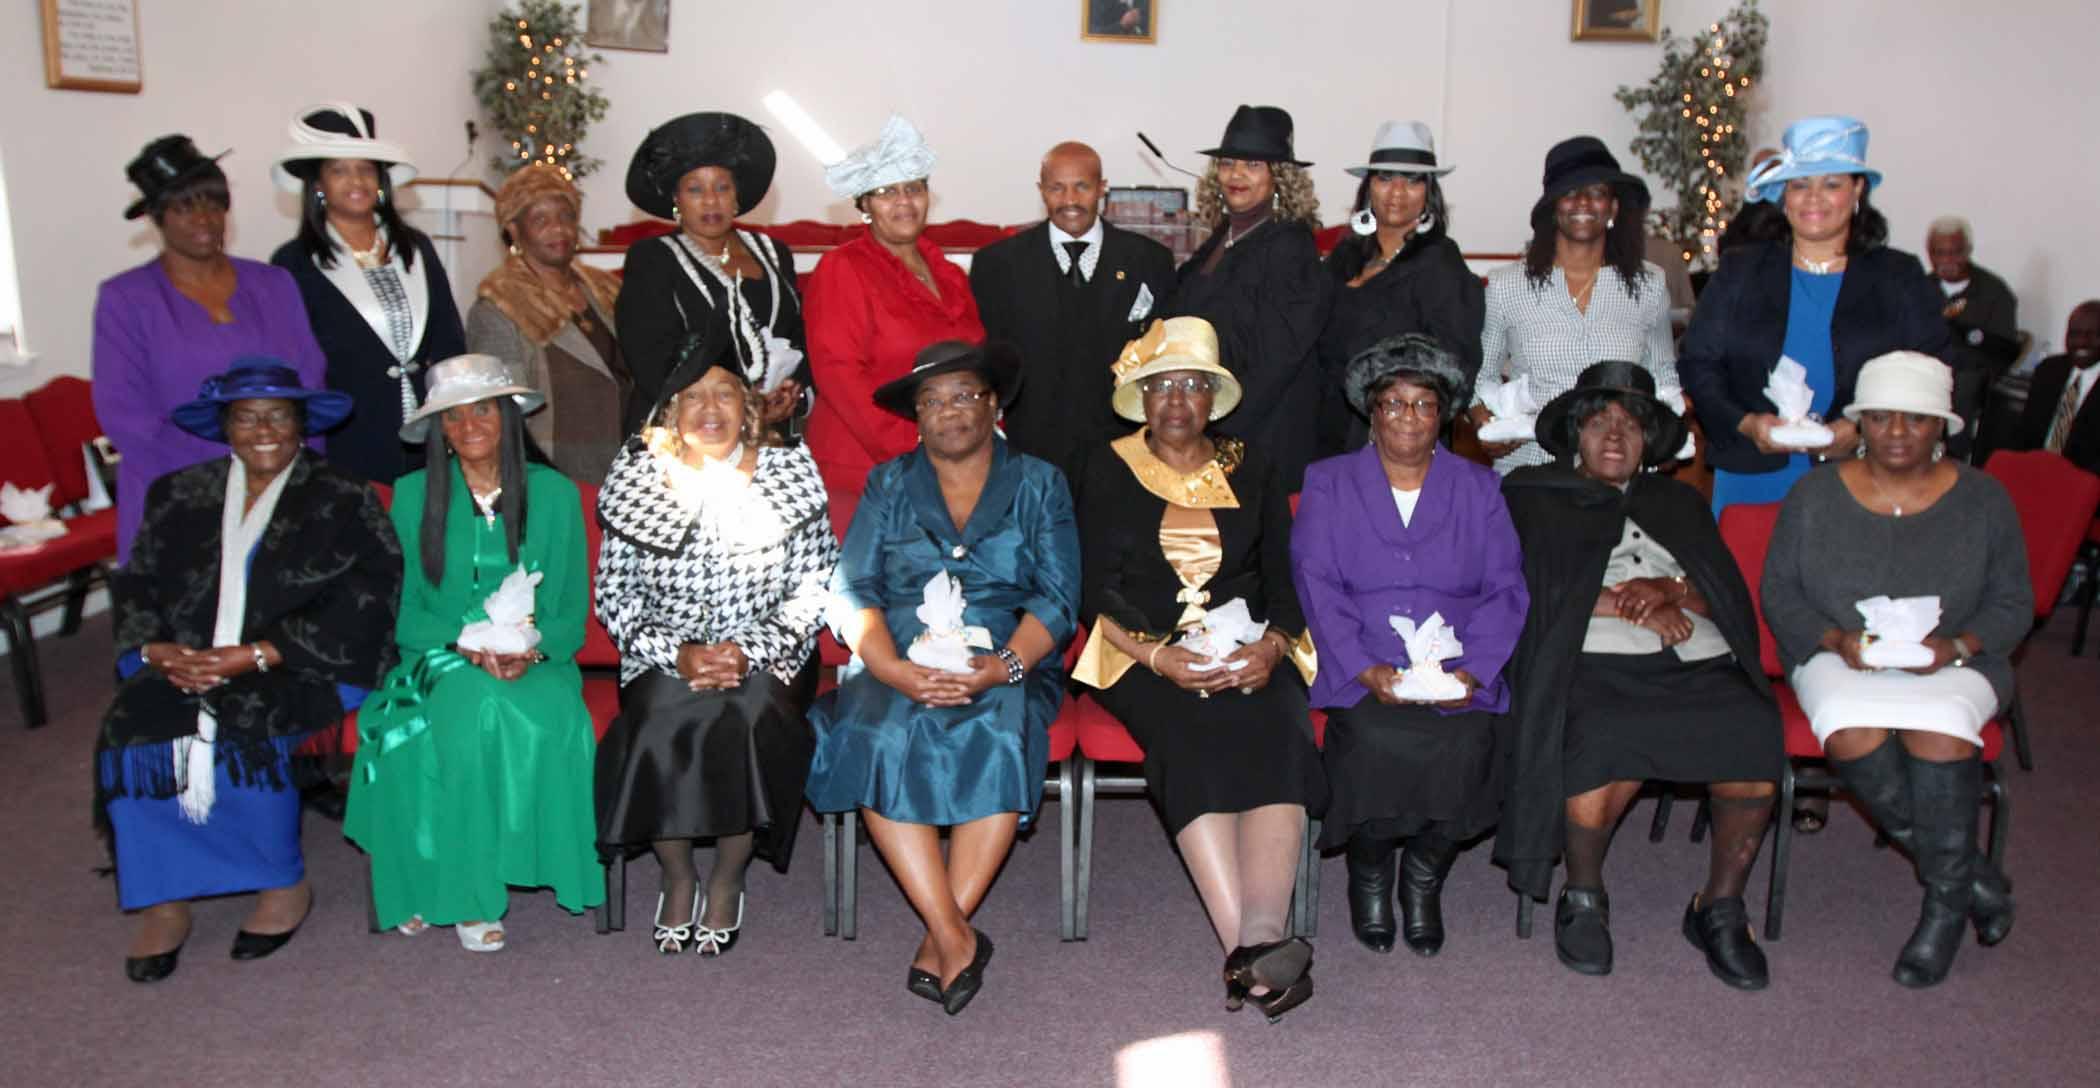 Parade of Hats